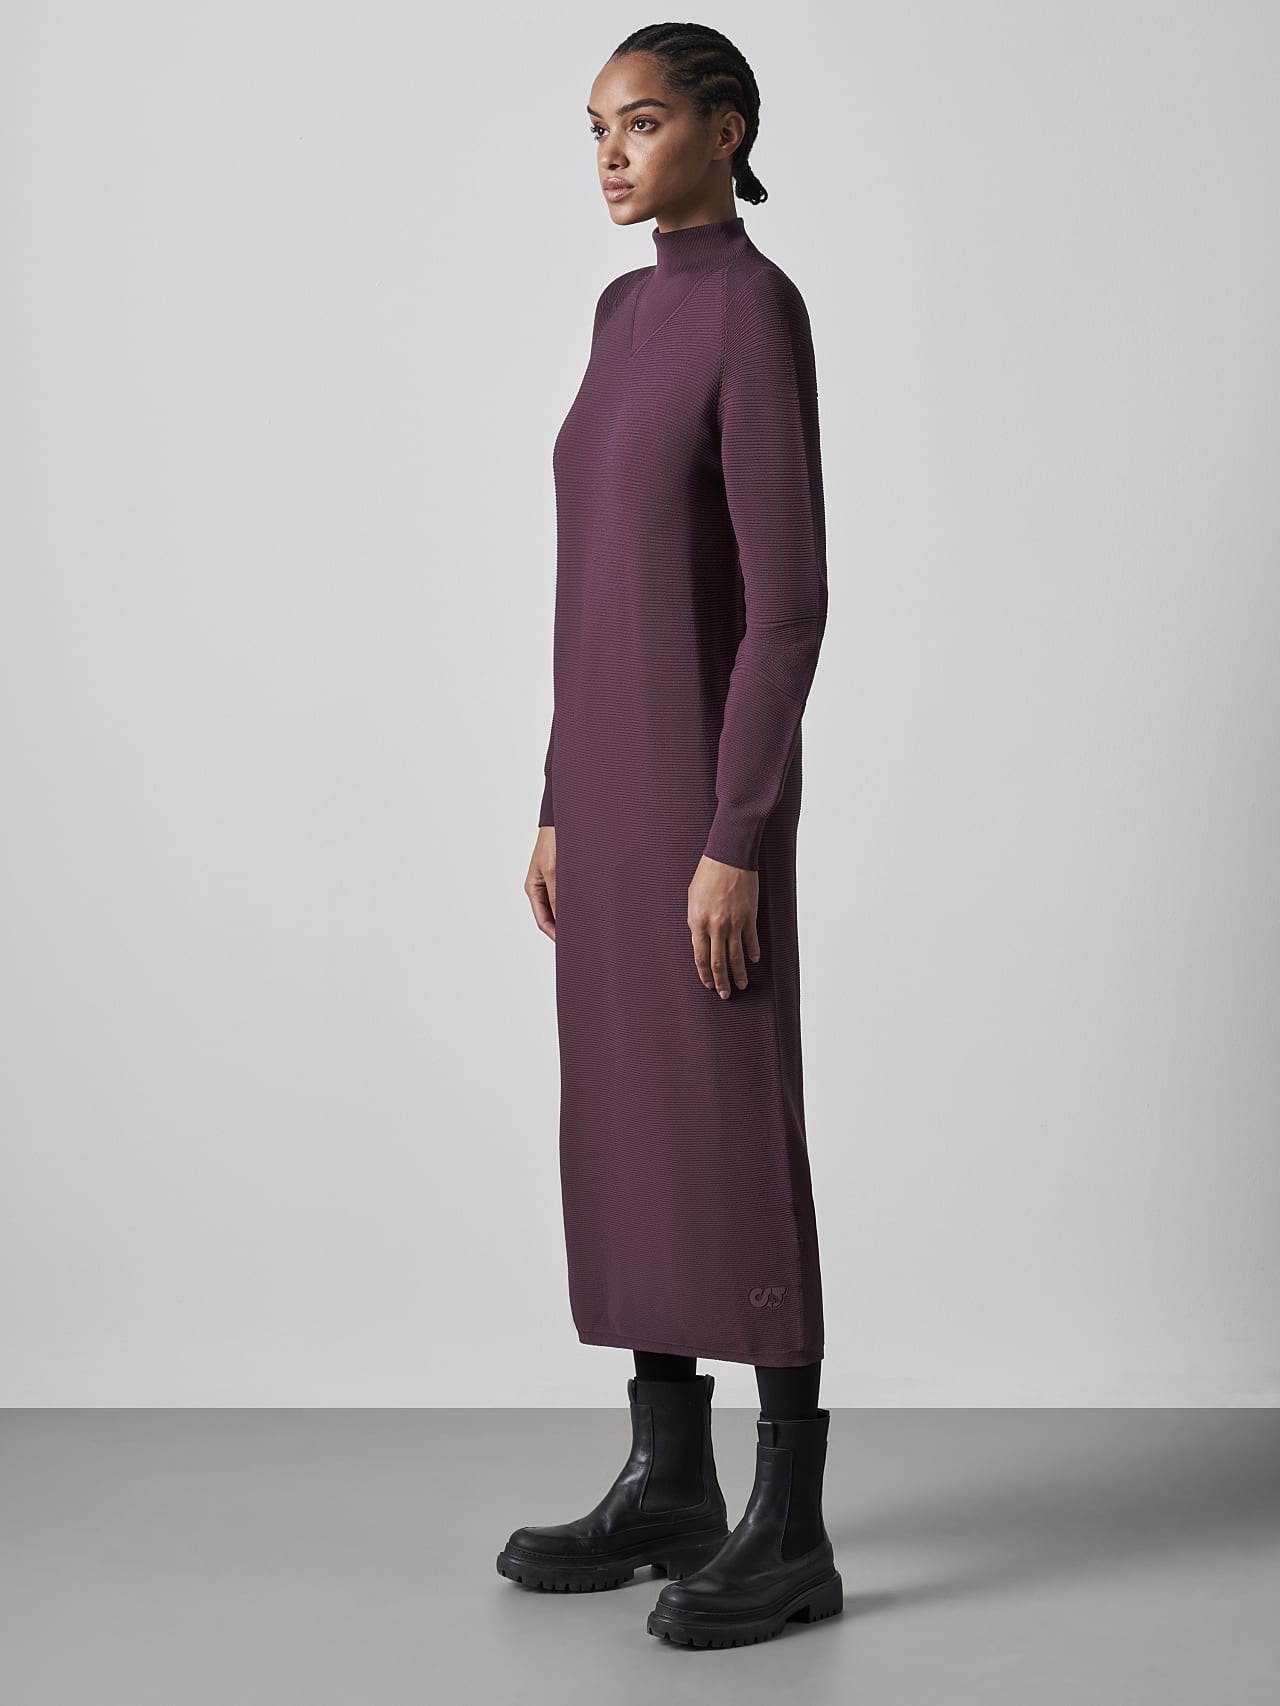 FOXEE V1.Y5.02 Seamless 3D Knit Mock-Neck Dress Burgundy Front Alpha Tauri